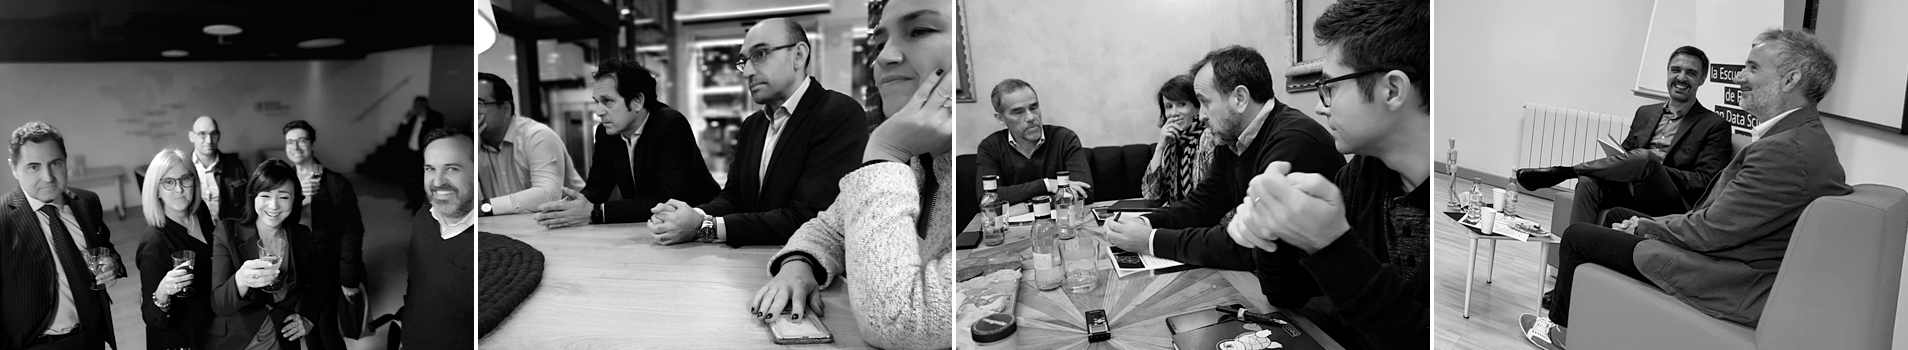 foto_agenda_leonardos_club.png